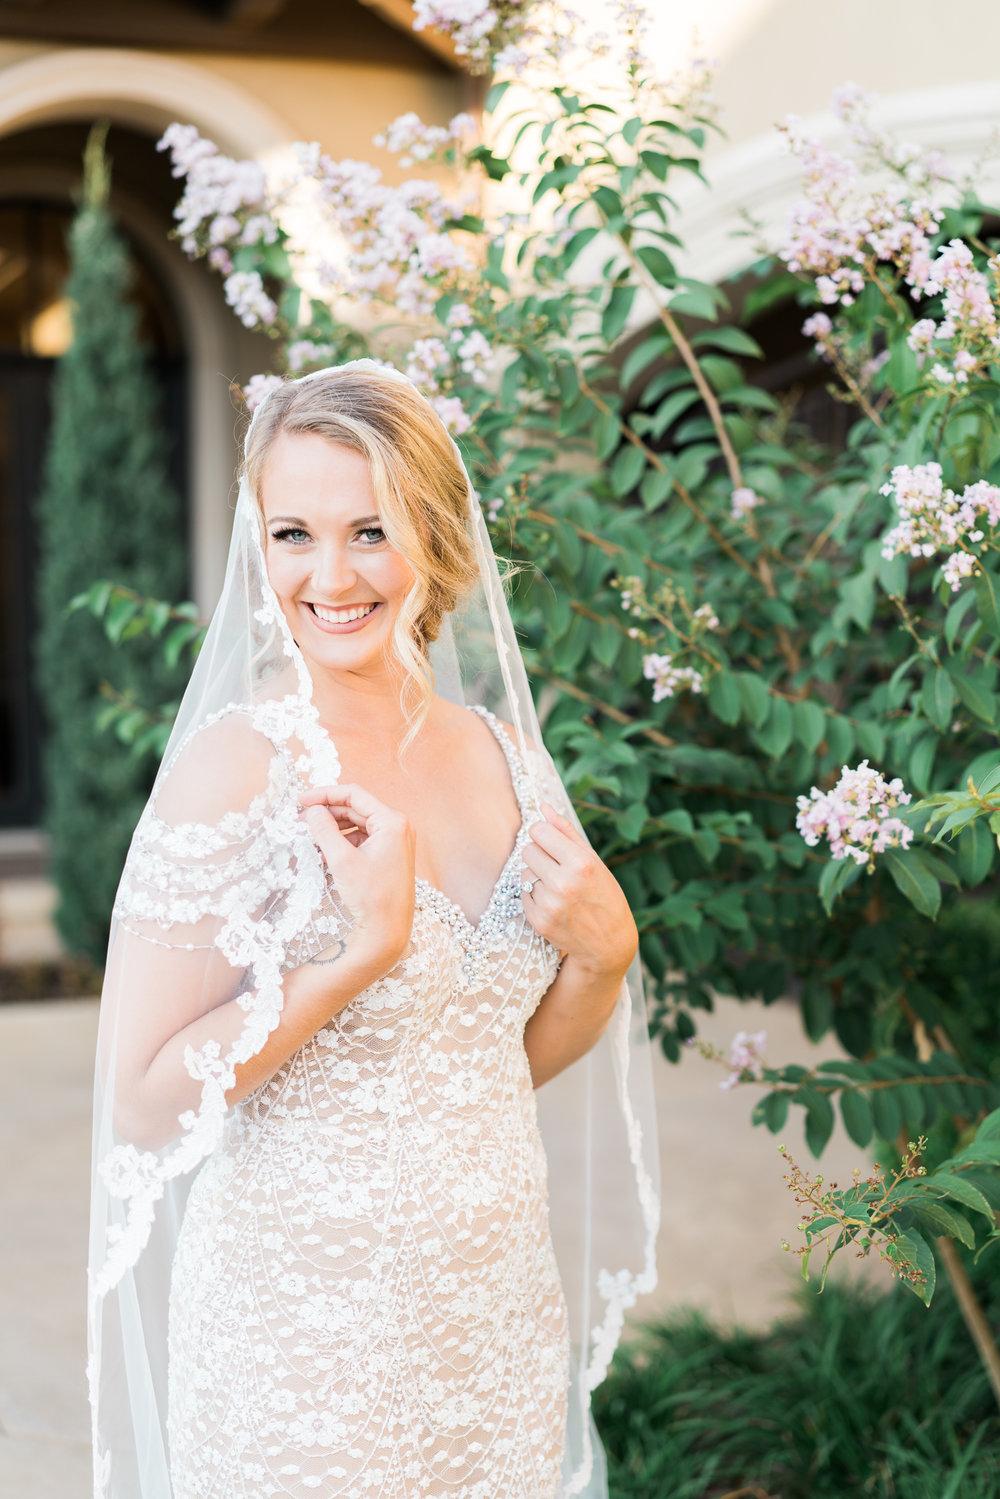 Clytee-Bridal-Portraits-Web-22.jpg